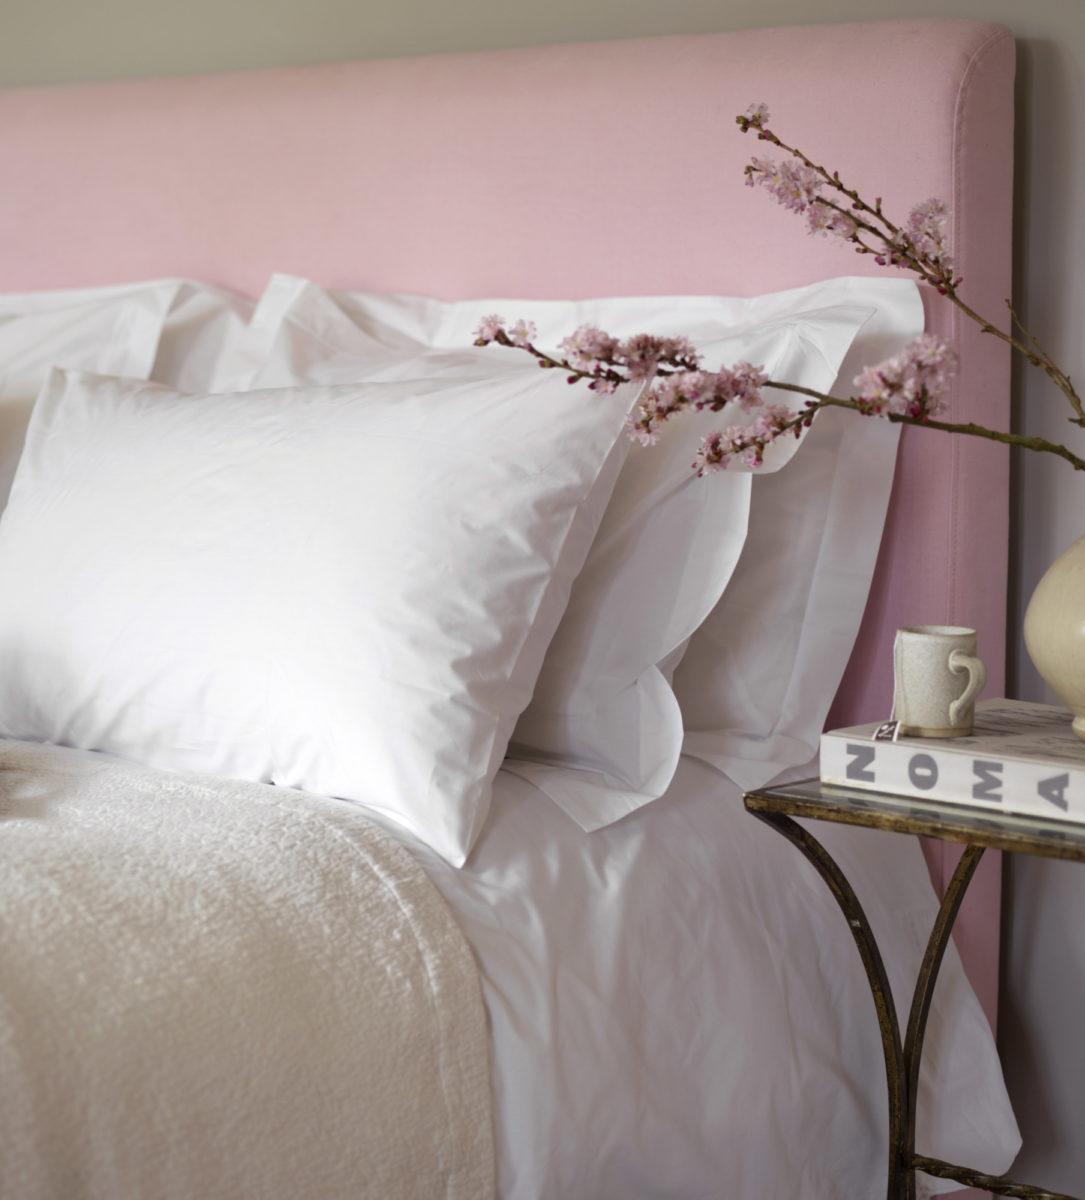 white cotton percale euorpean size pillowcases 50 x 80cm secret linen store